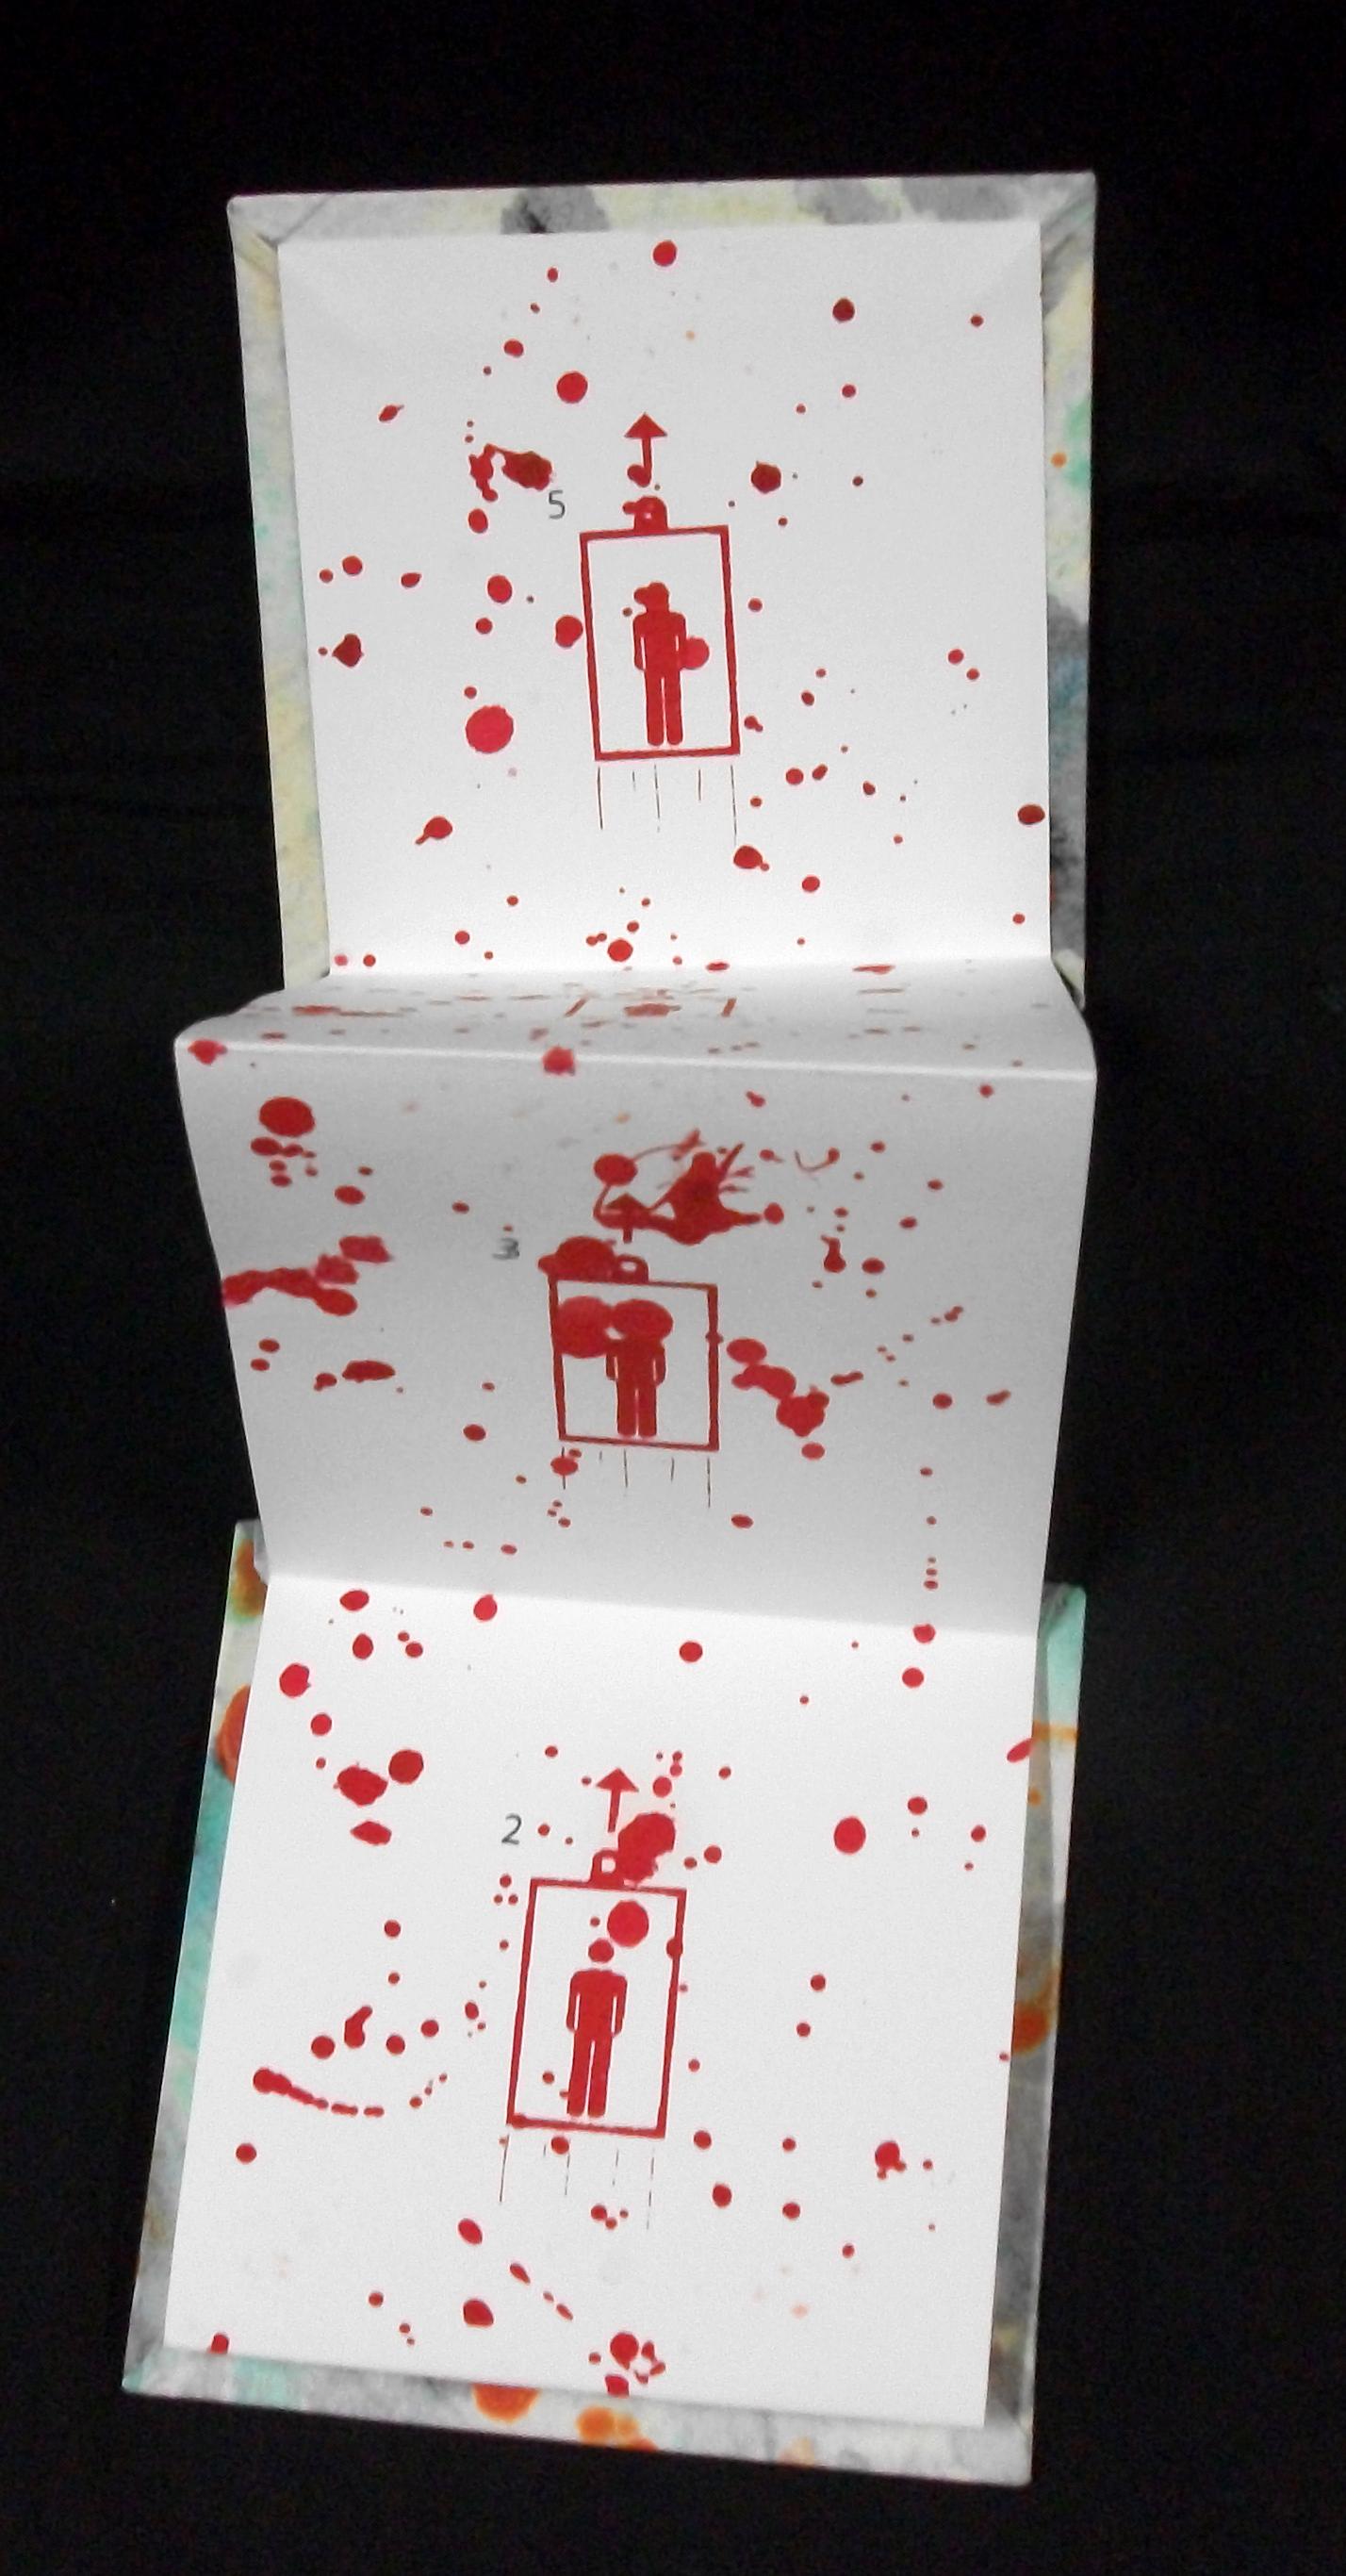 Death by Elevator, John (Ted) Thomas, Paste Paper, Screen Print on Reeves BFK, Virginia, 2011